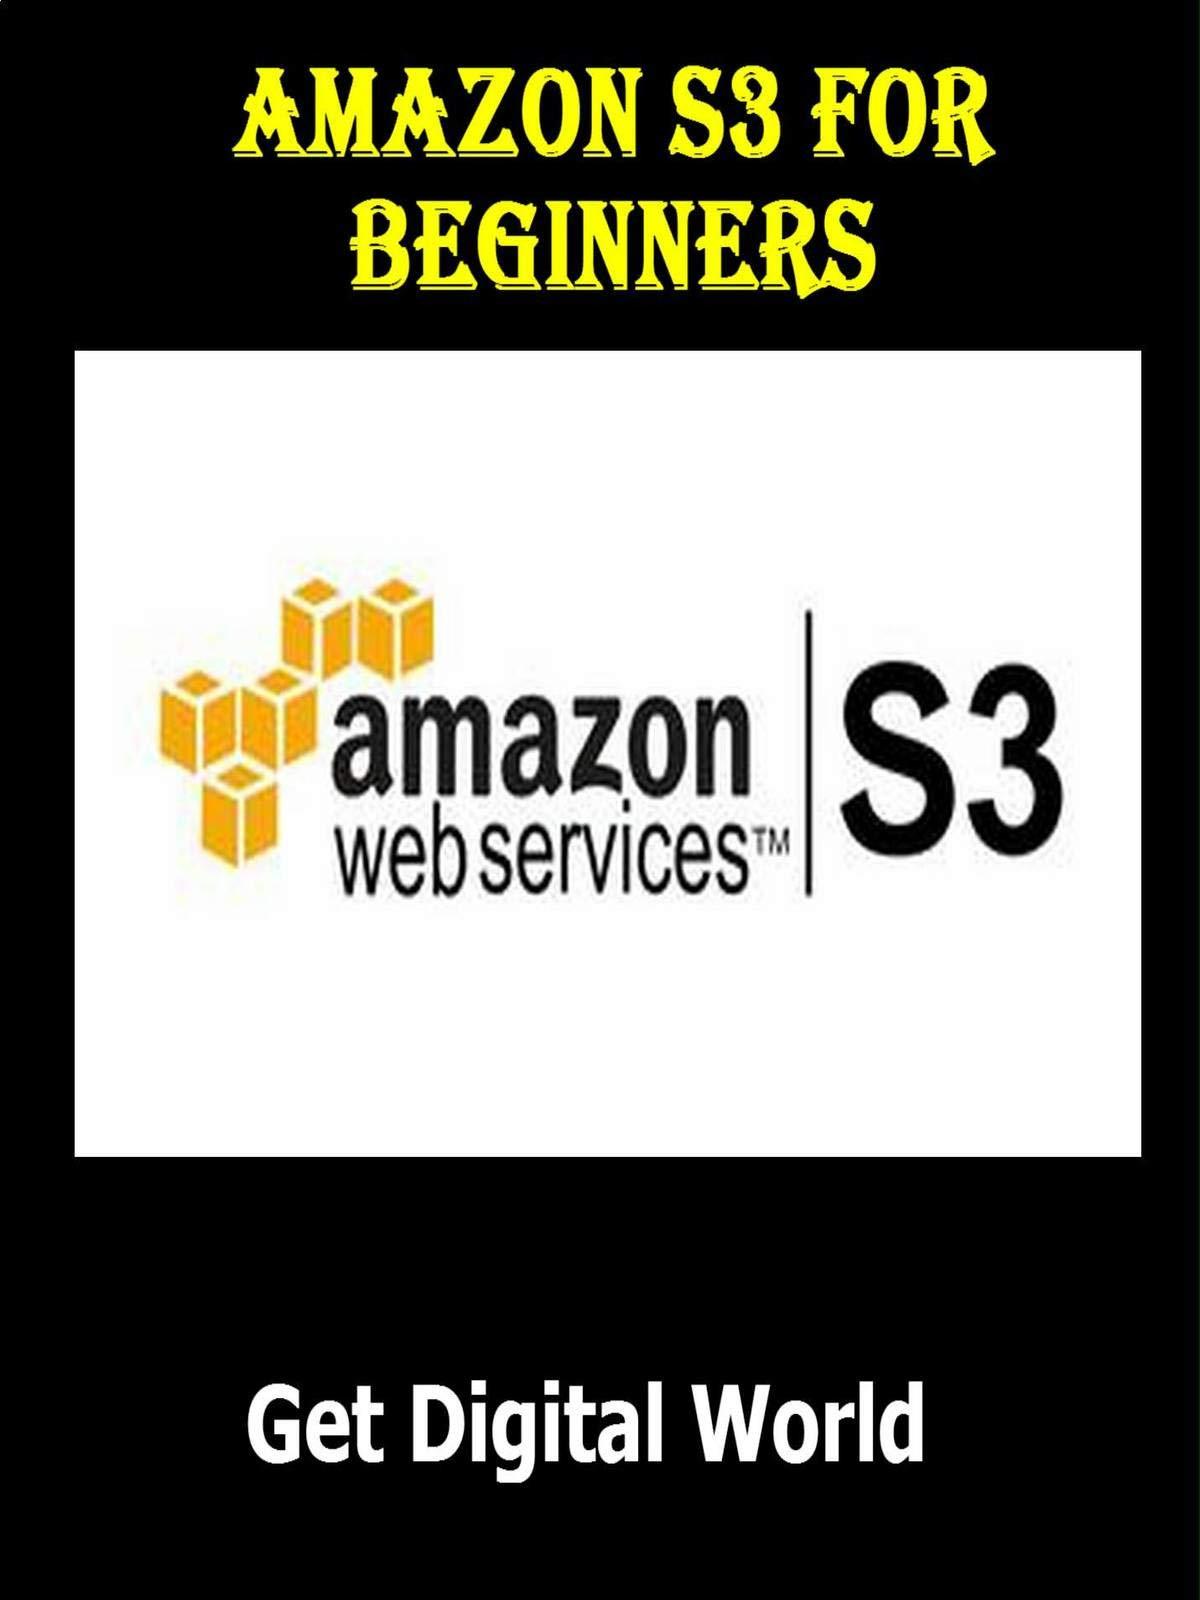 Amazon S3 For Beginners on Amazon Prime Video UK